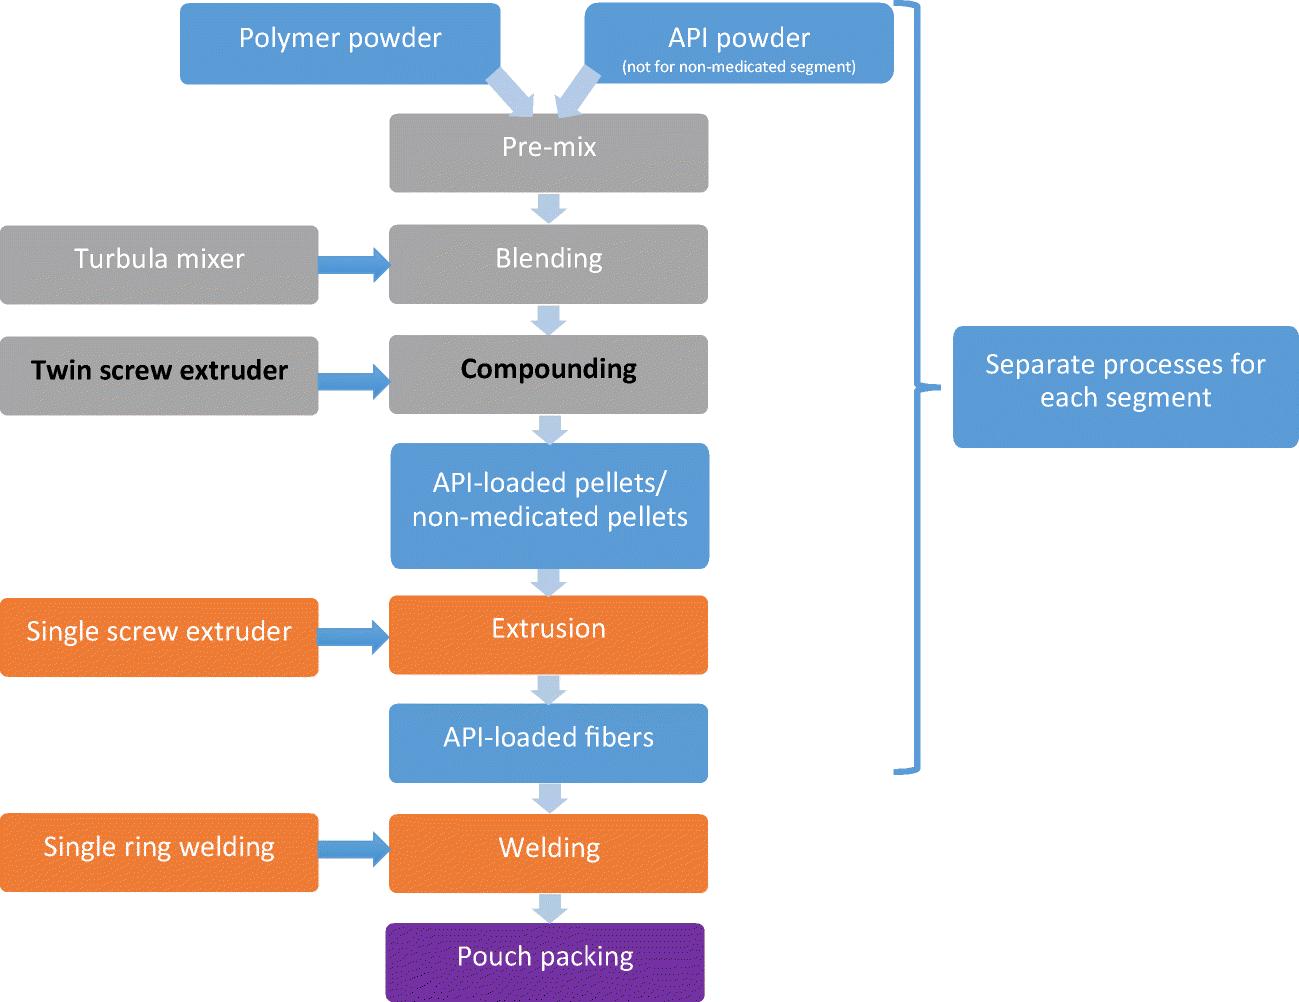 Pharmacokinetics and tolerability of a novel progesterone